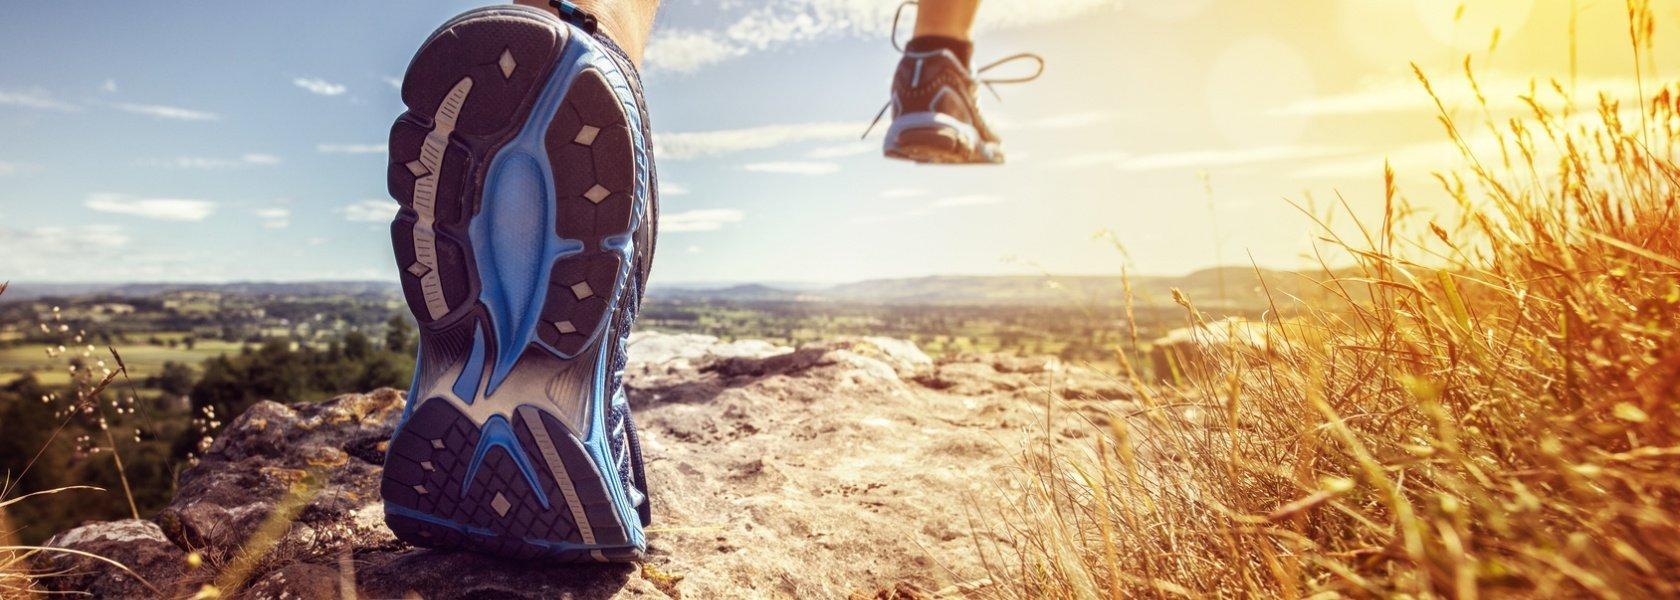 Bieganie i Nordic Walking